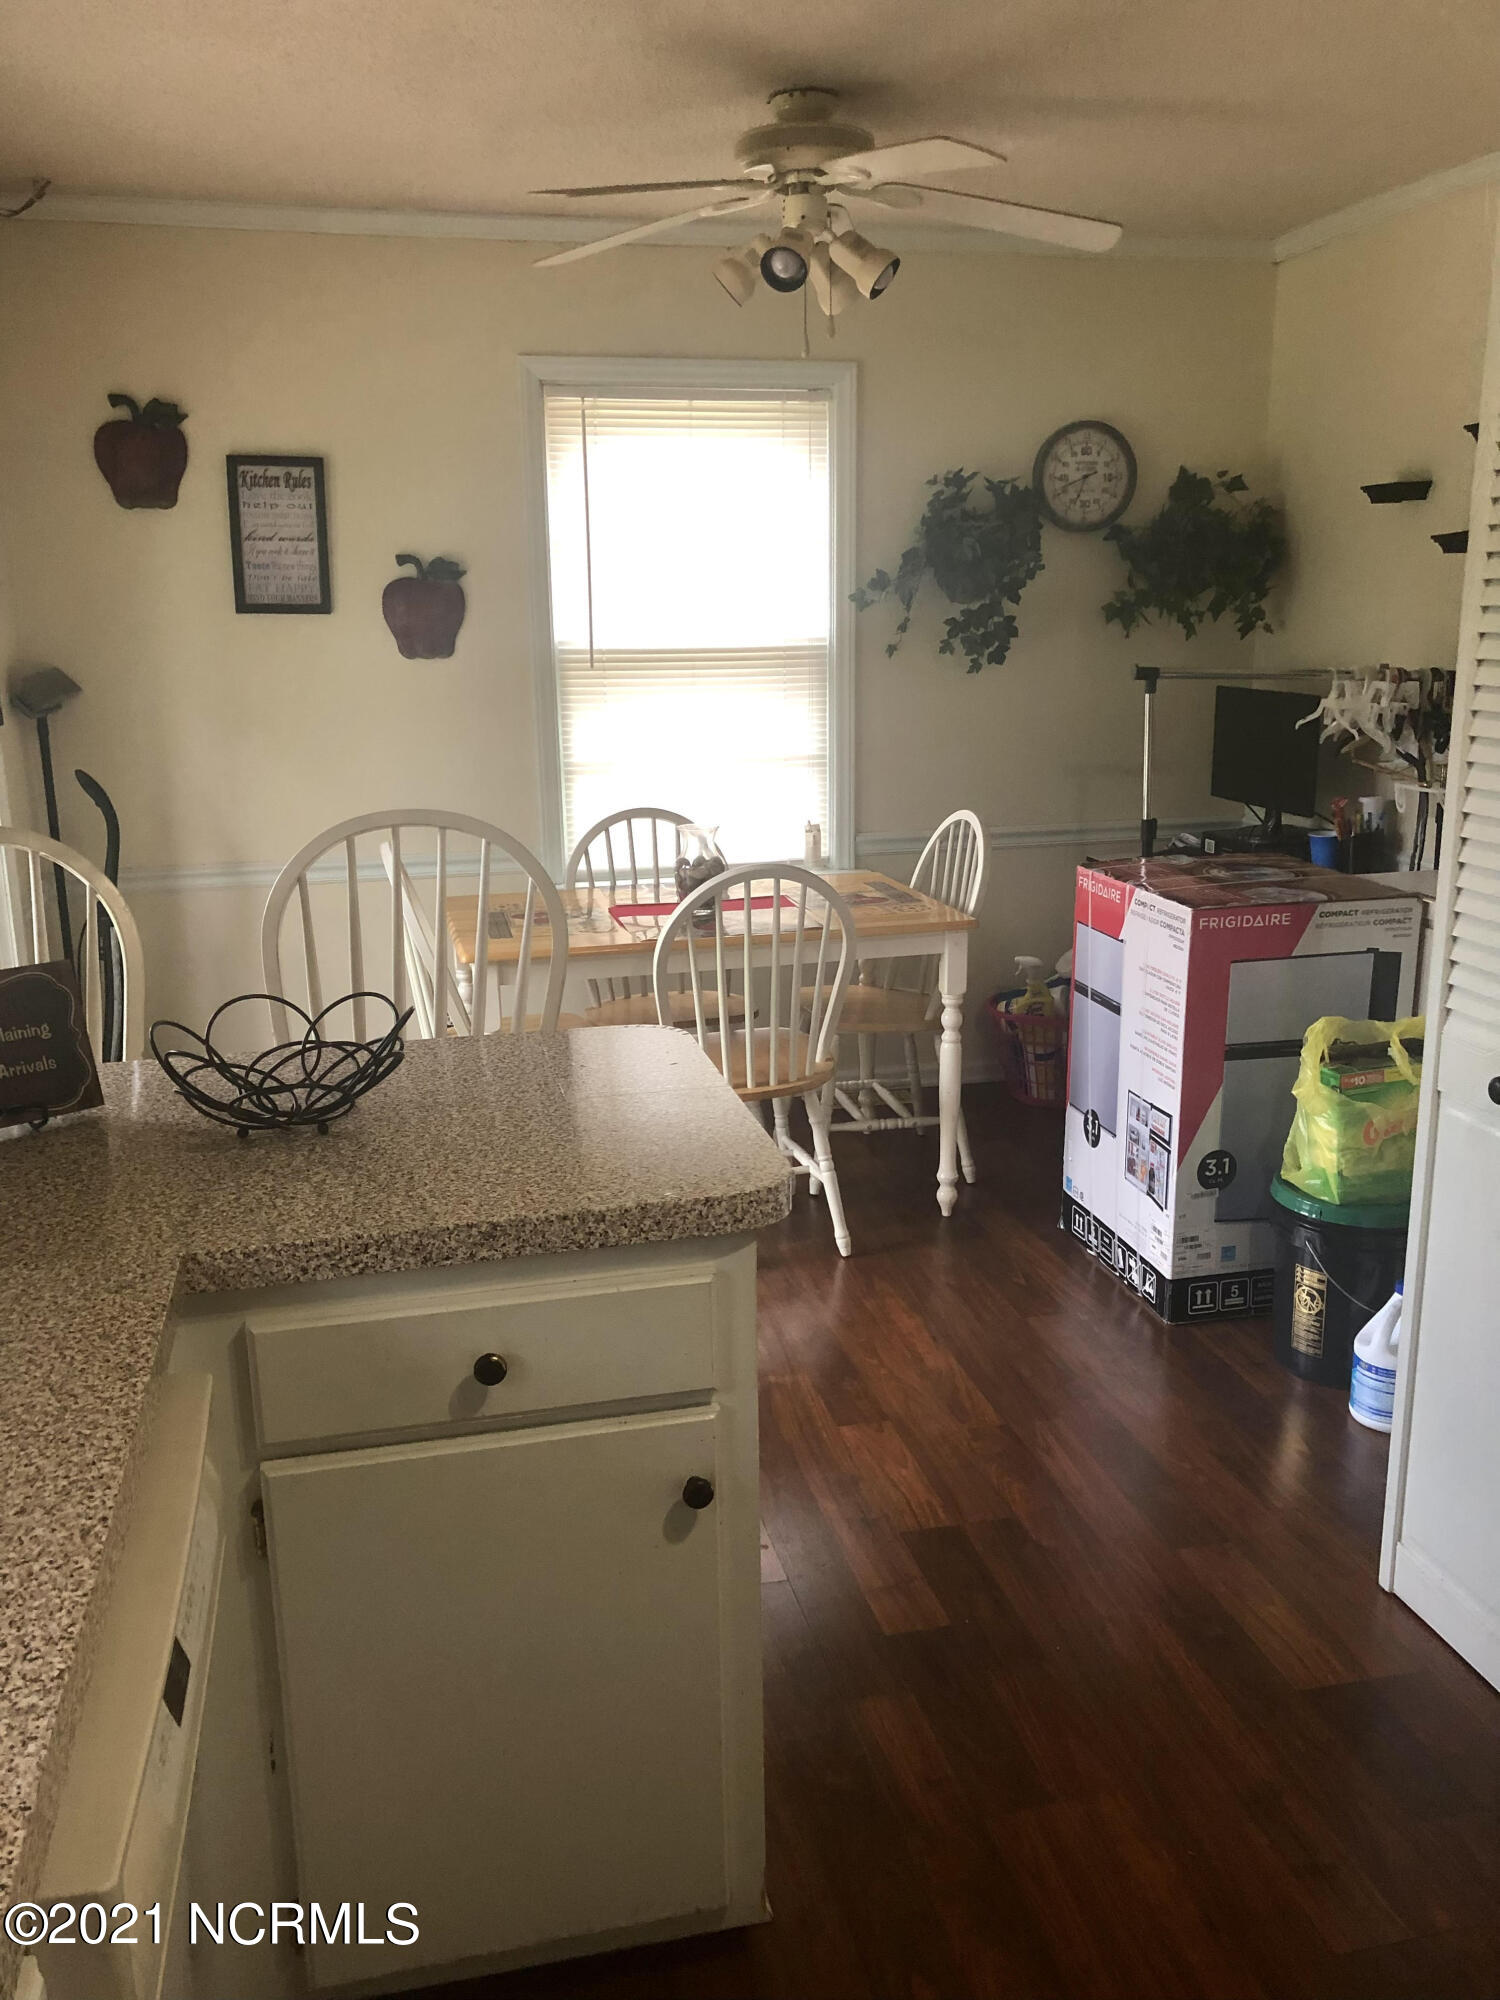 611 Benson Drive, Tarboro, North Carolina 27886, 3 Bedrooms Bedrooms, 5 Rooms Rooms,2 BathroomsBathrooms,Single family residence,For sale,Benson,100285482